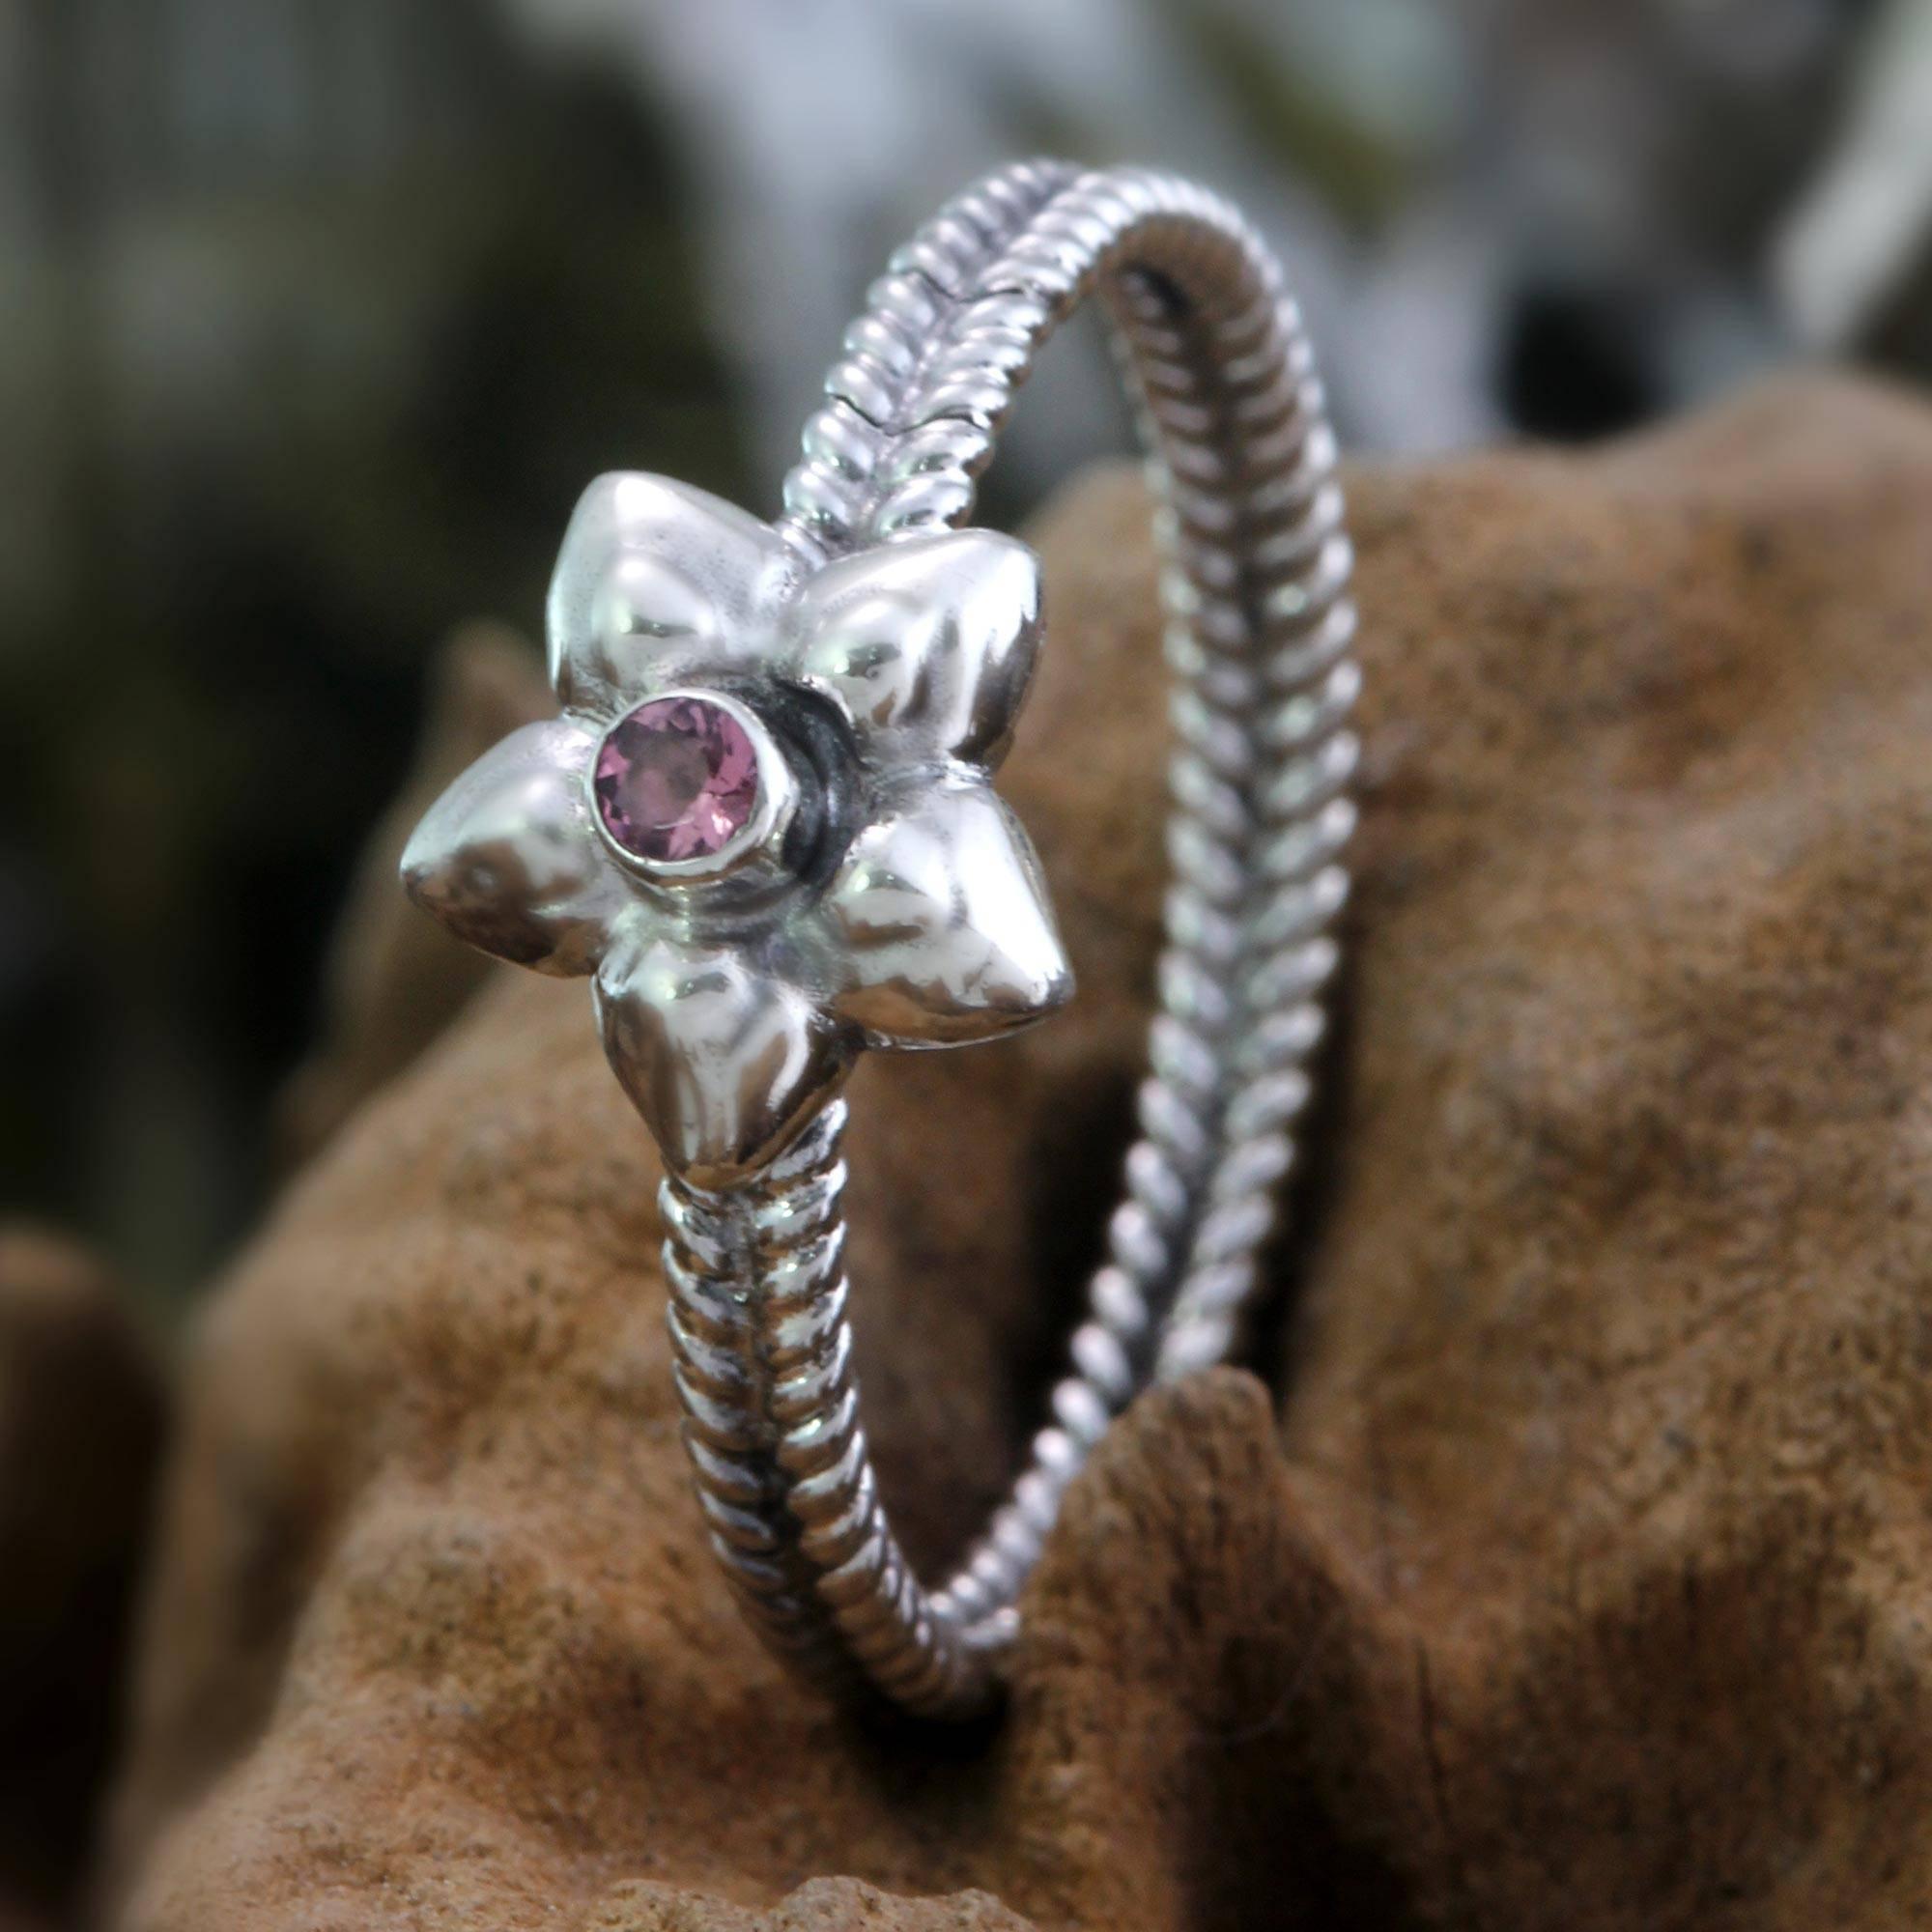 Pink tourmaline ring, 'October Marigold' Tourmaline, The Unknown October Birthstone